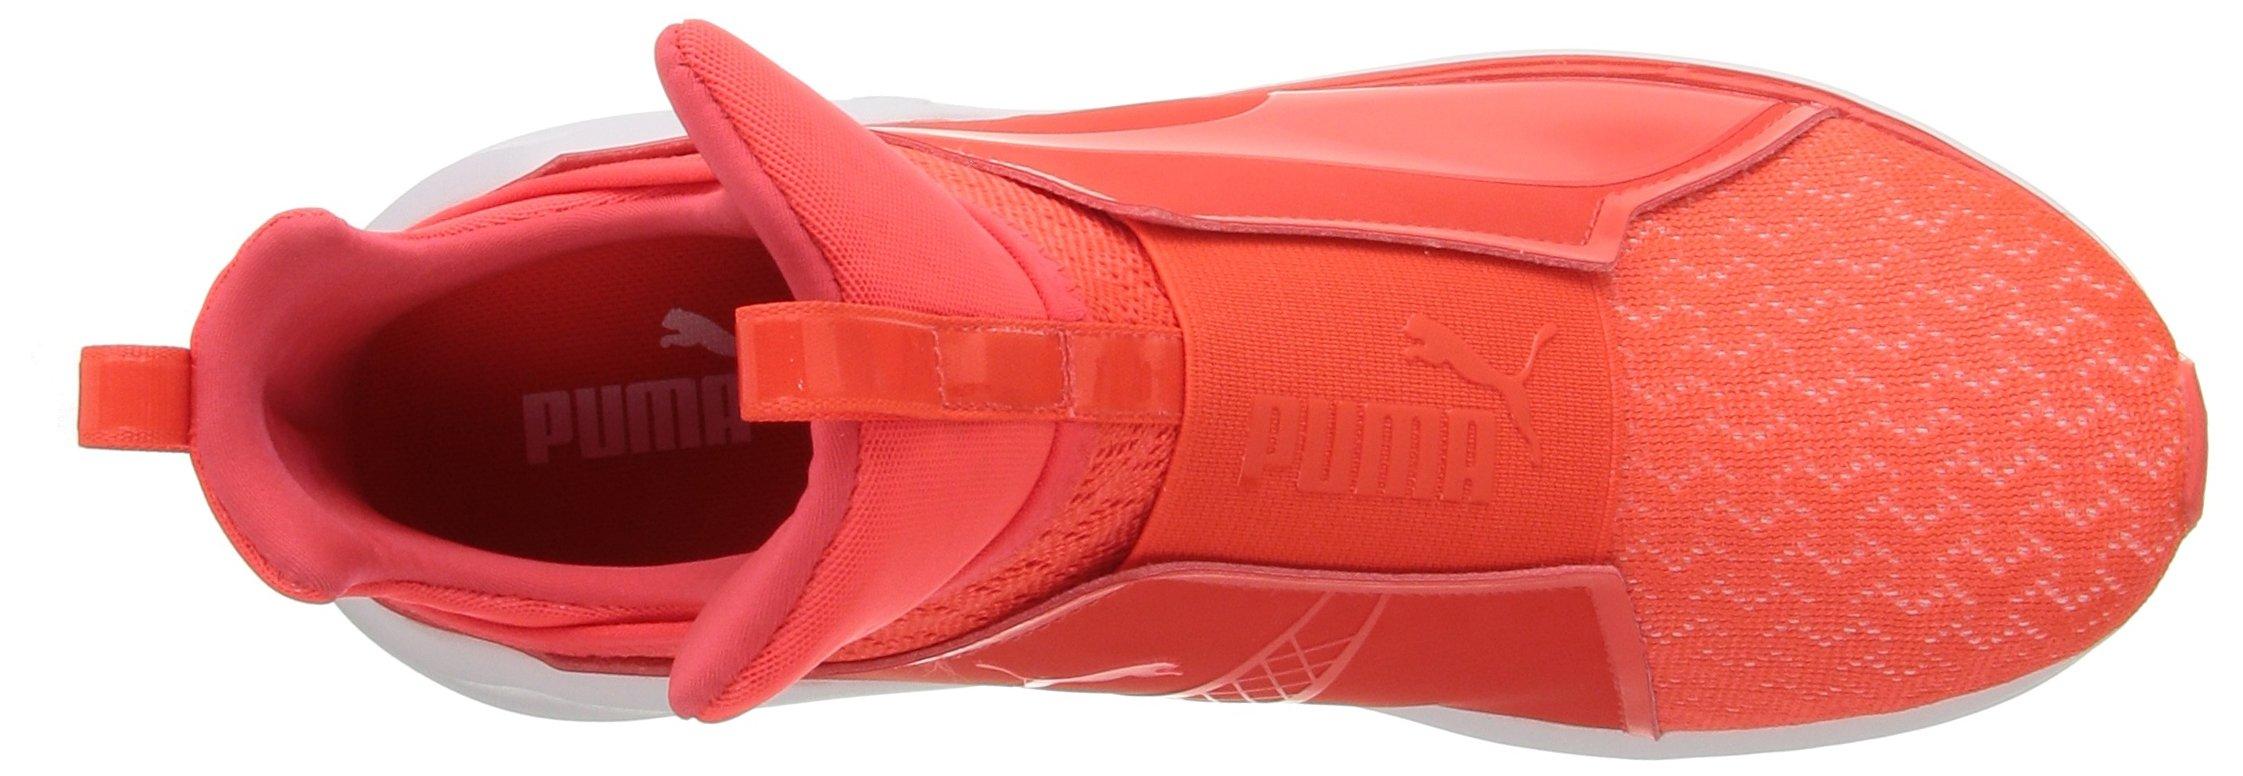 PUMA Women's Fierce Eng Mesh Cross-Trainer Shoe, Red Blast White, 5.5 M US by PUMA (Image #8)